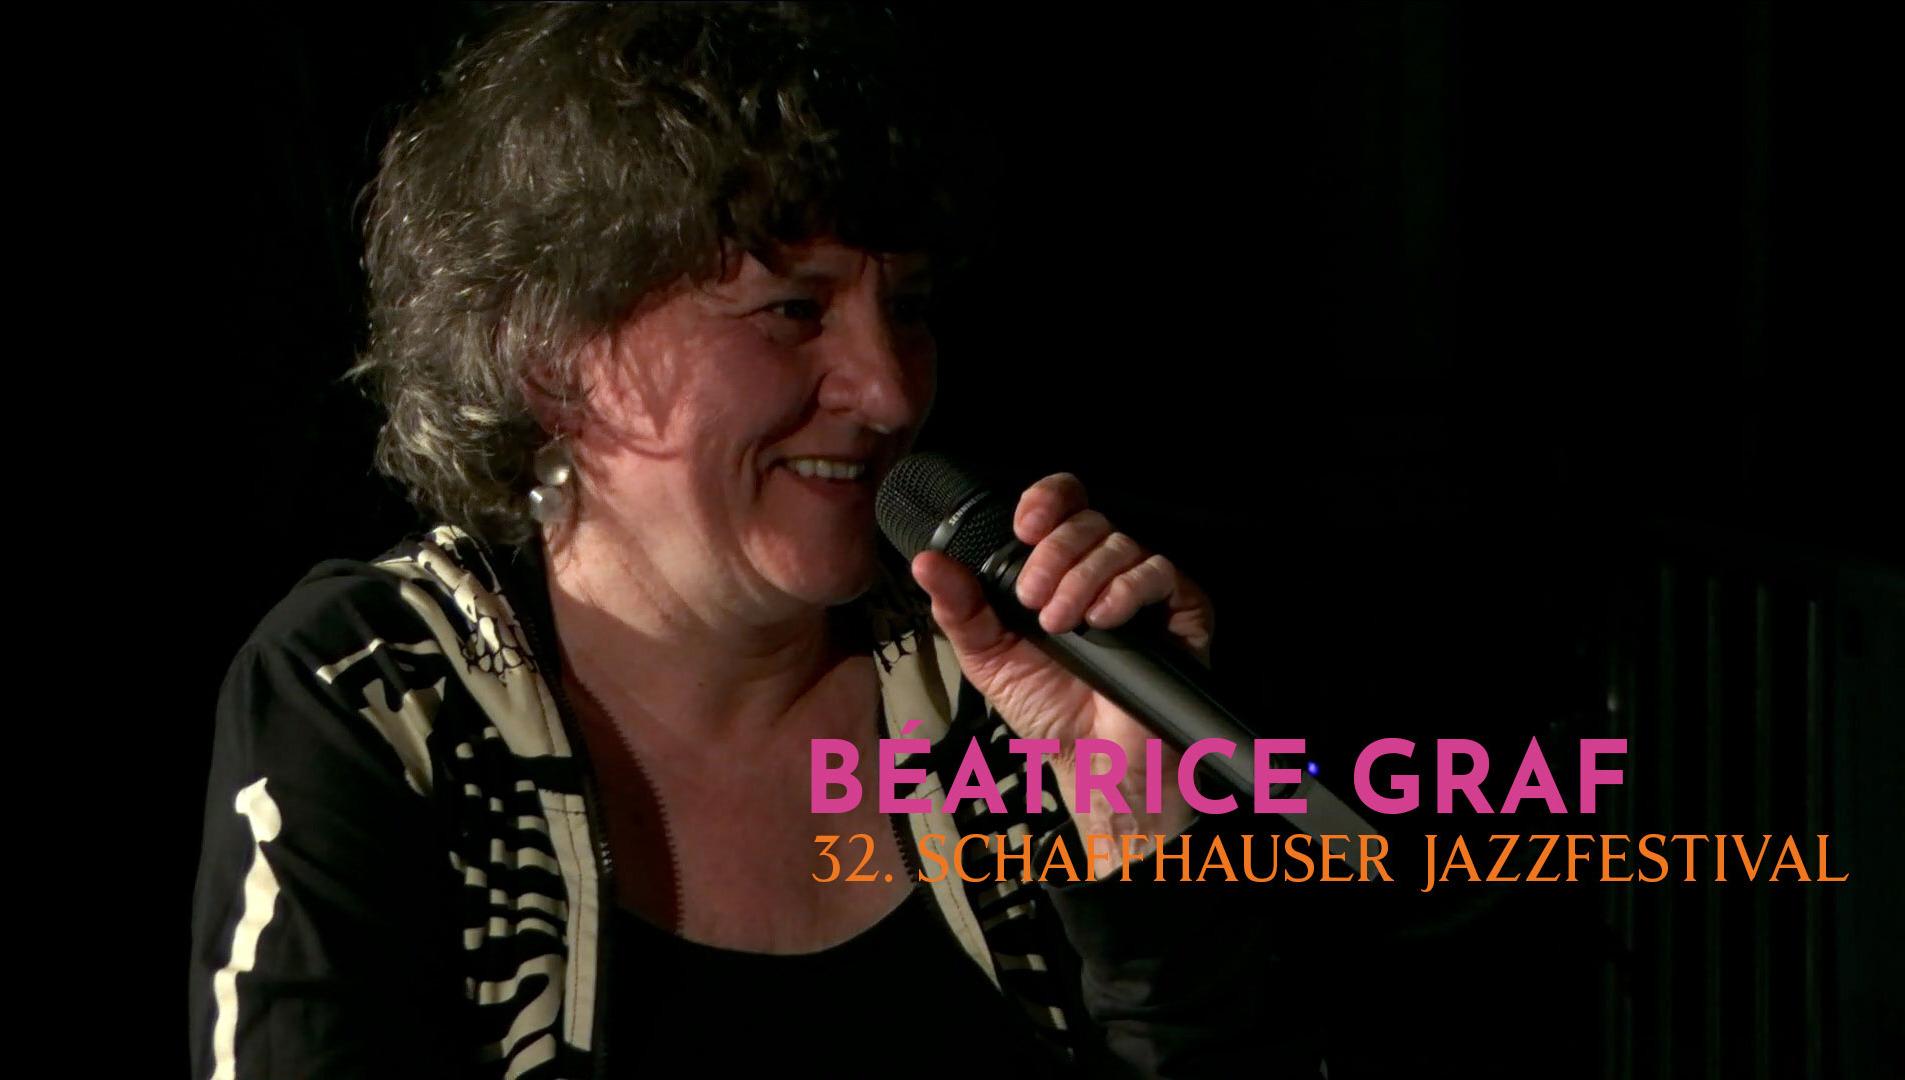 Béatrice Graf